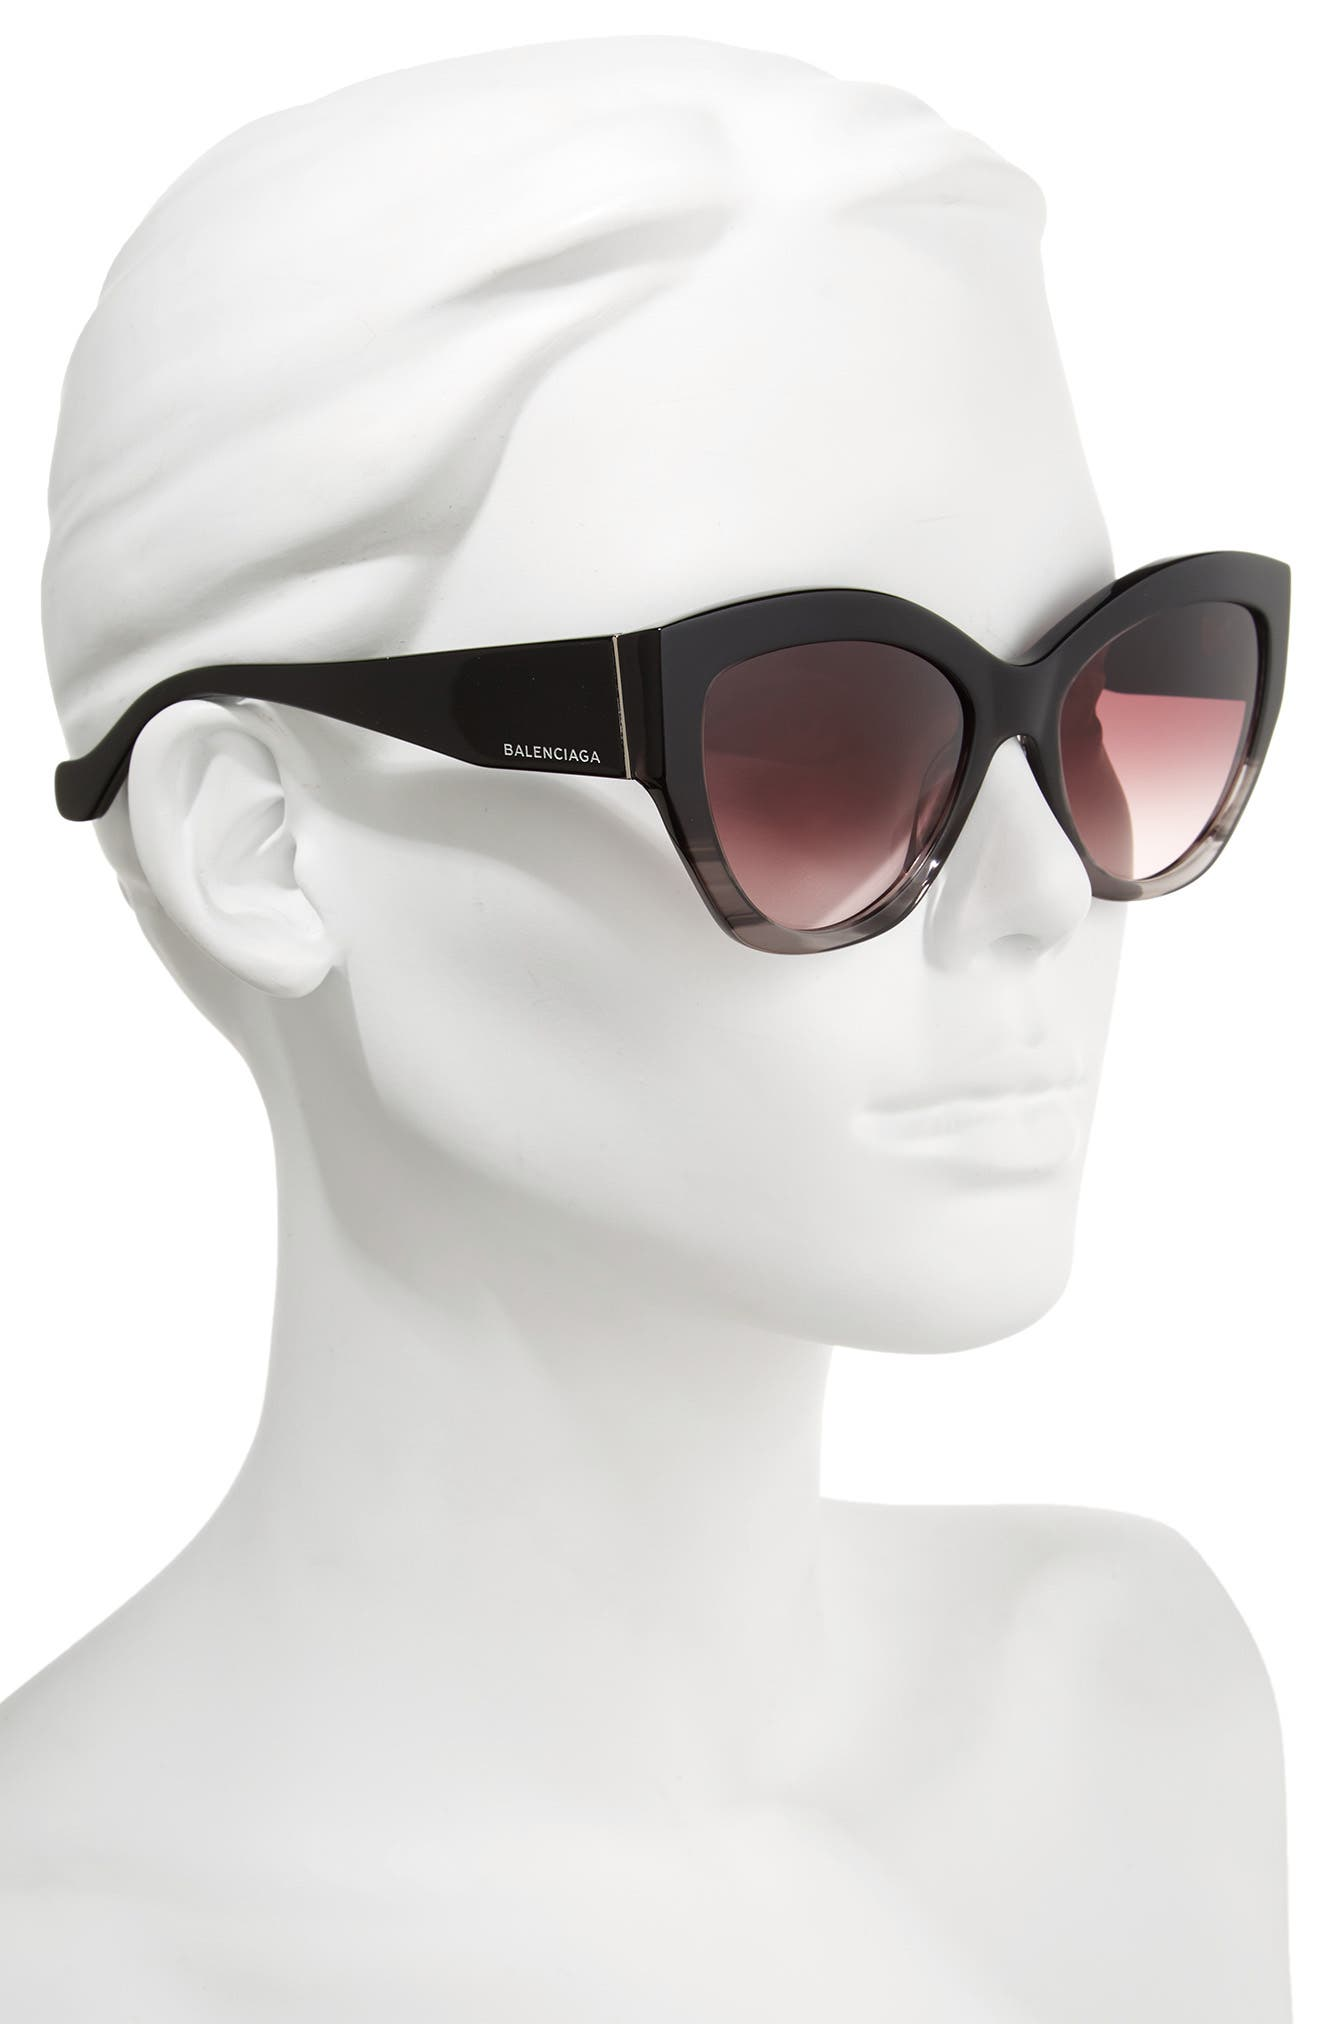 56mm Cat Eye Sunglasses,                             Alternate thumbnail 2, color,                             Striped Black/ Opal/ Ruthenium